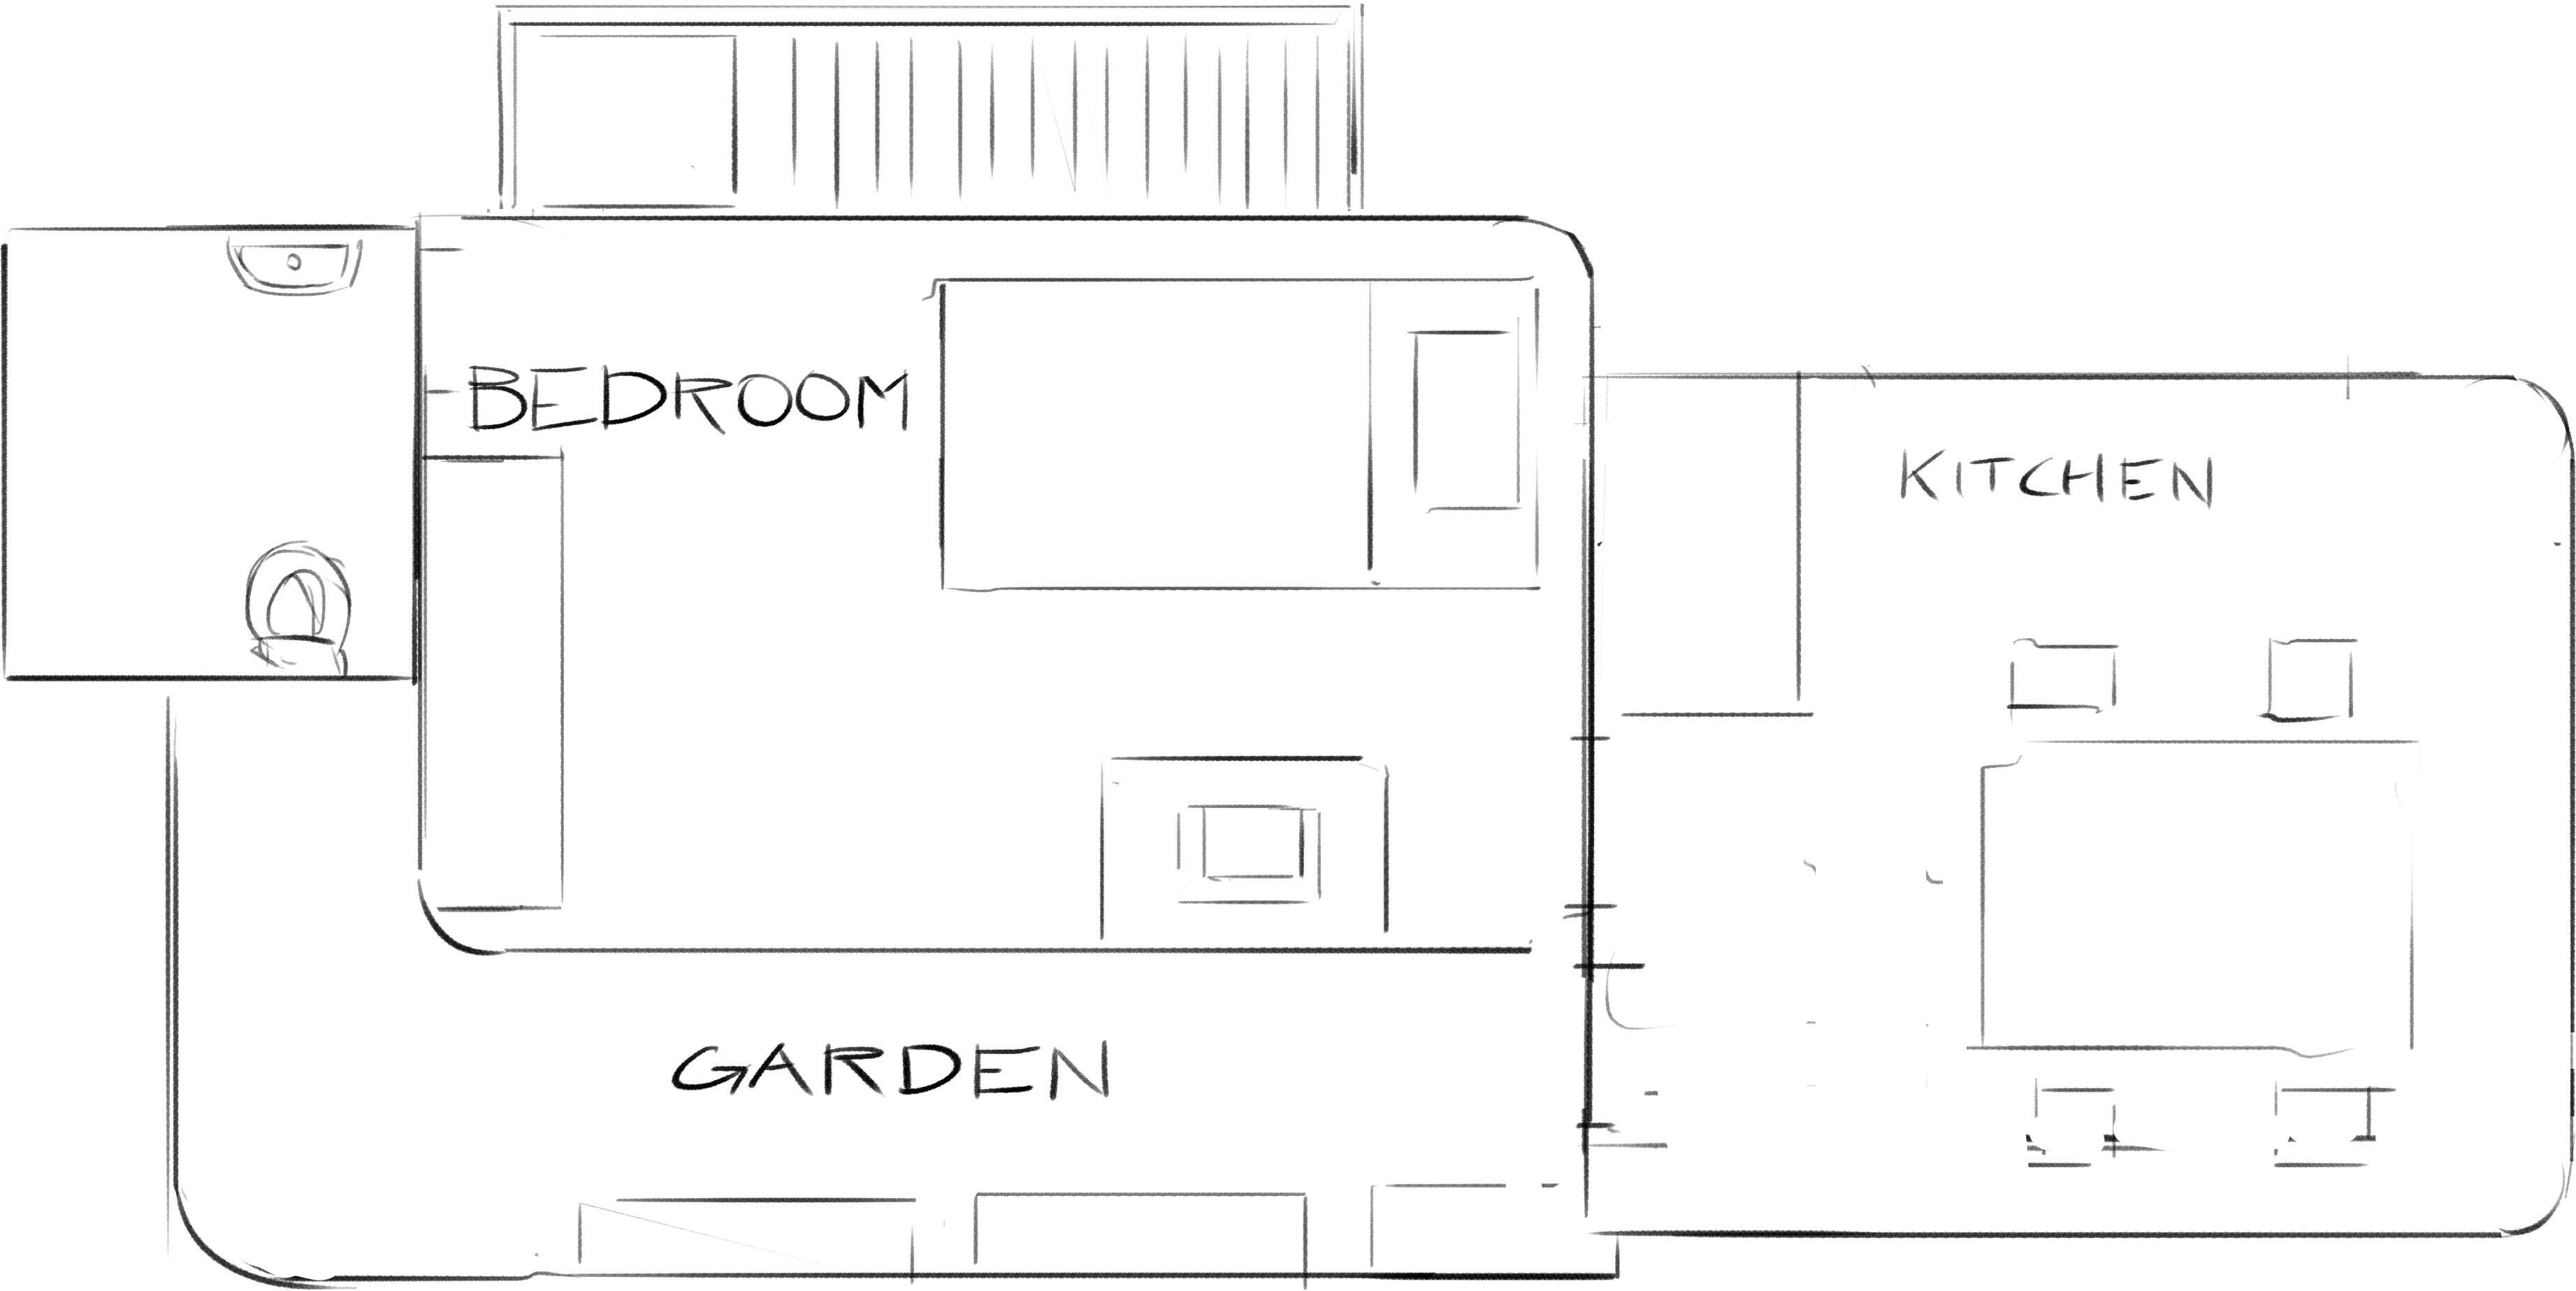 Upper level plan view